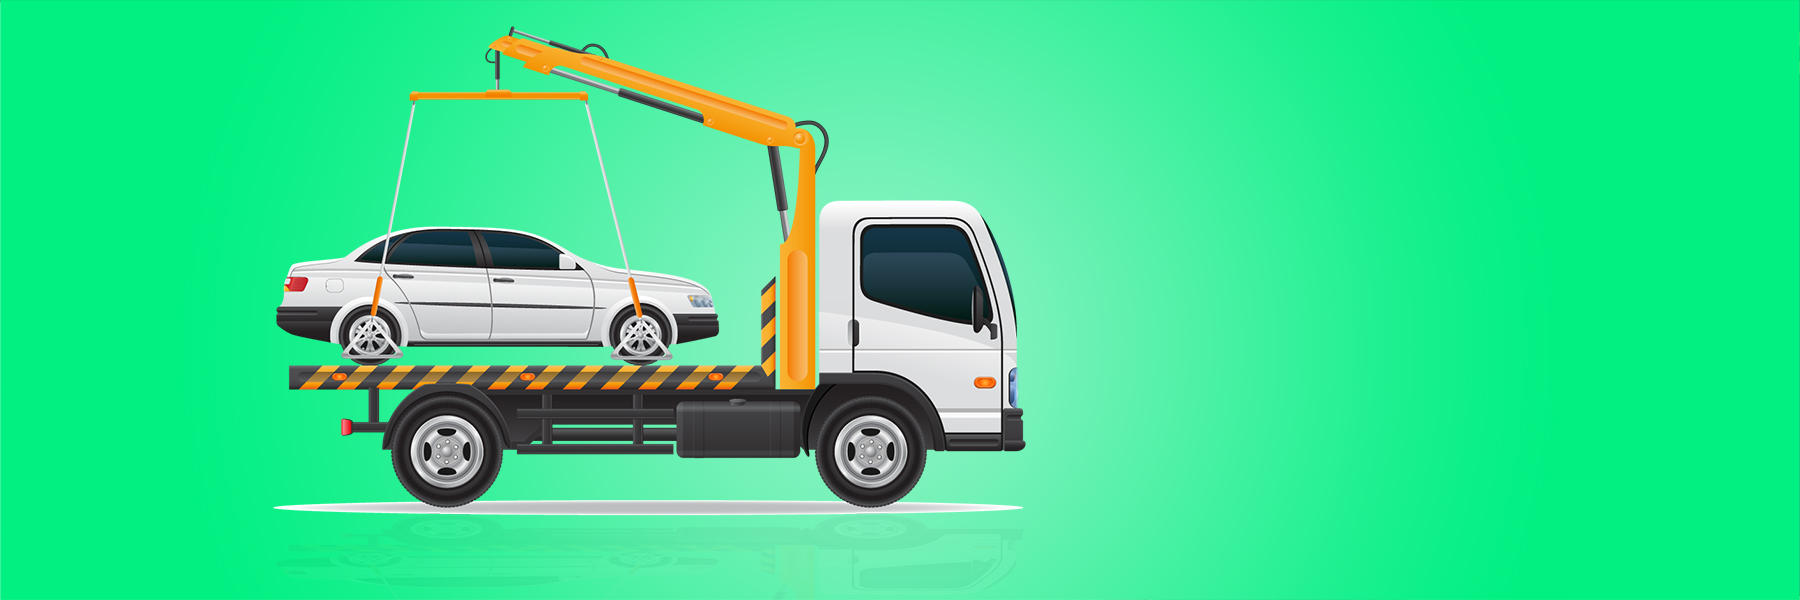 car career services